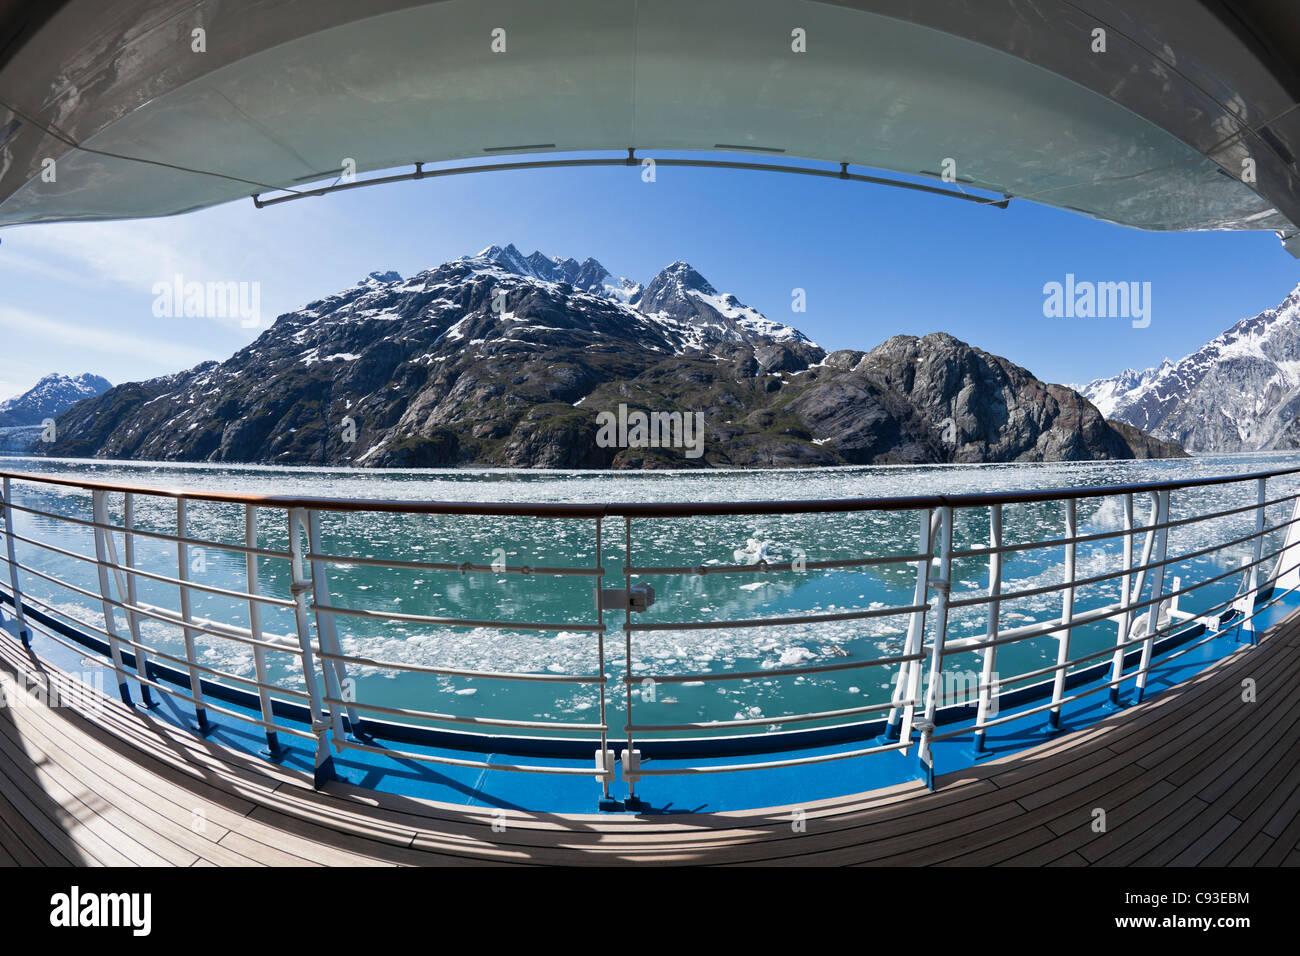 Fisheye view of empty cruise ship deck in Glacier Bay,Alaska - Stock Image